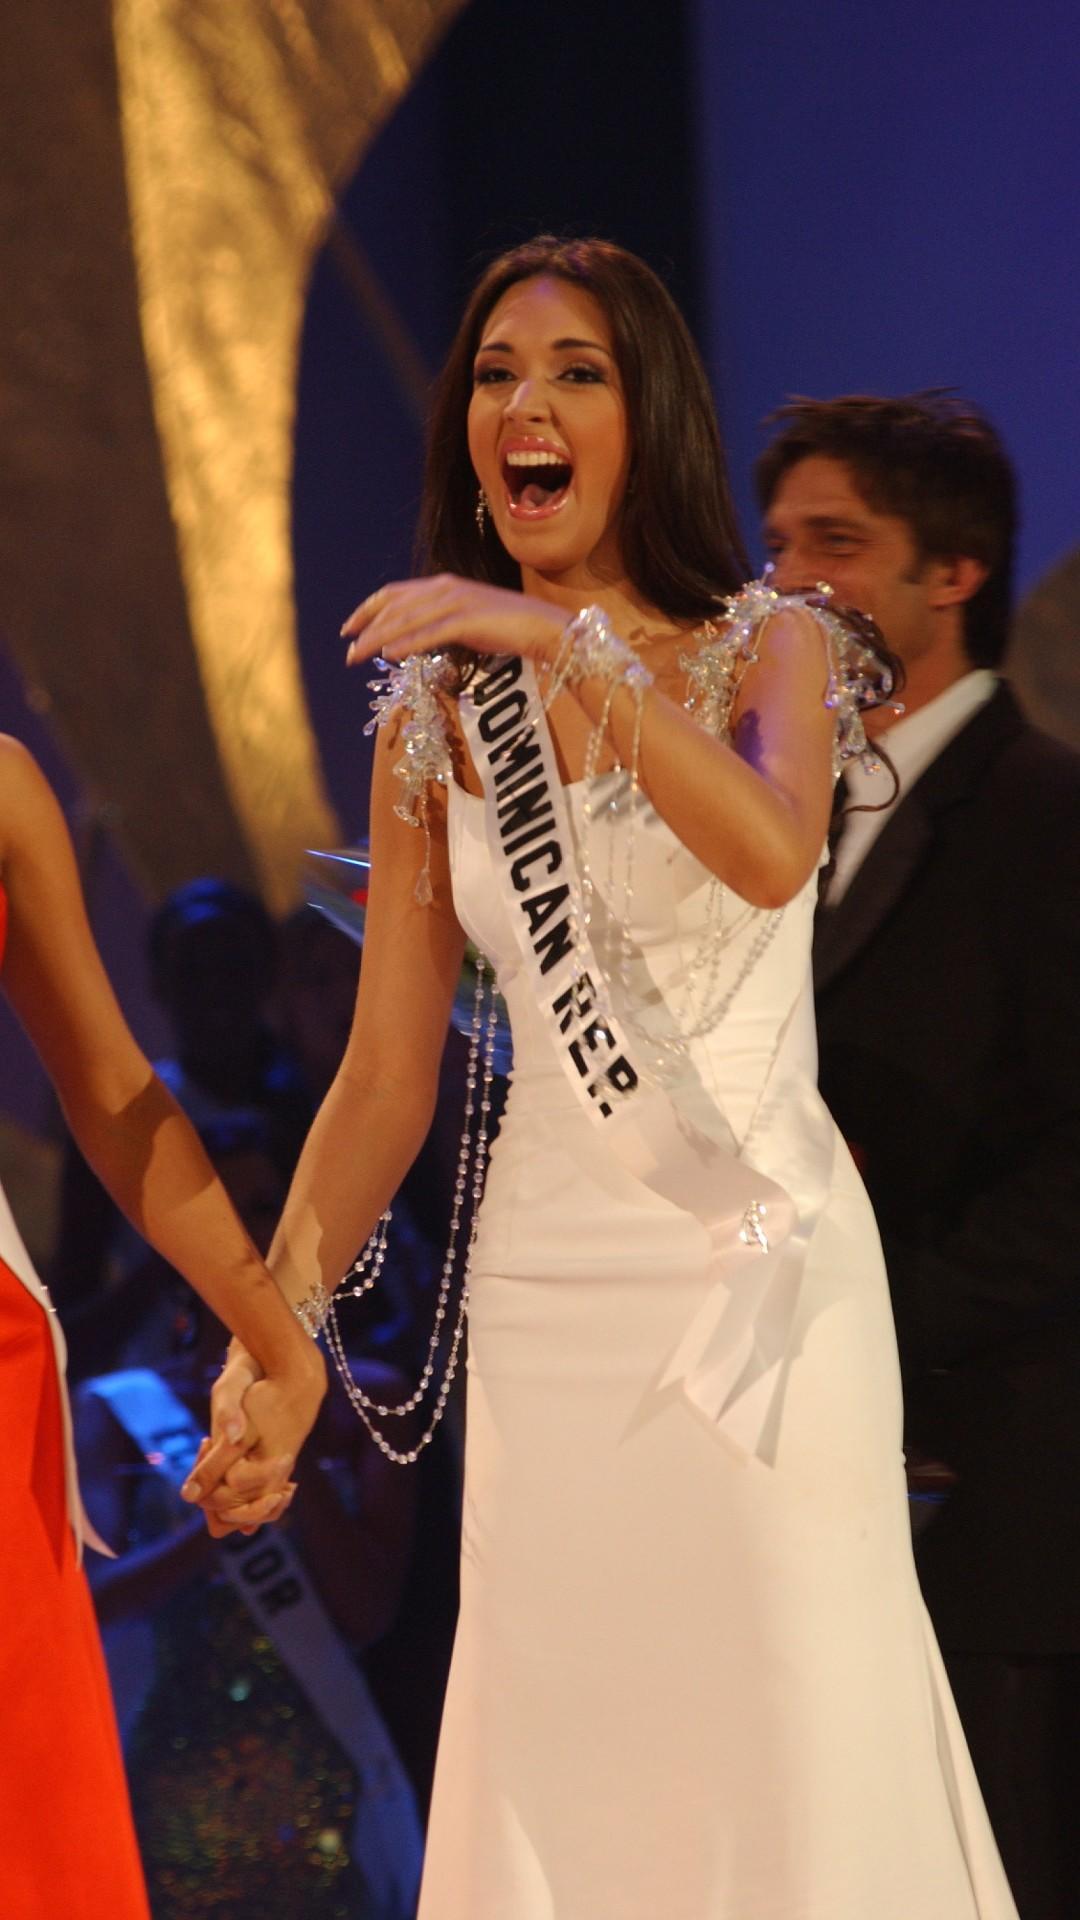 RECORDANDO REACCIONES DE REINAS DE BELLEZA Amelia-vega-miss-republica-dominicana-2003-miss-universo-2019